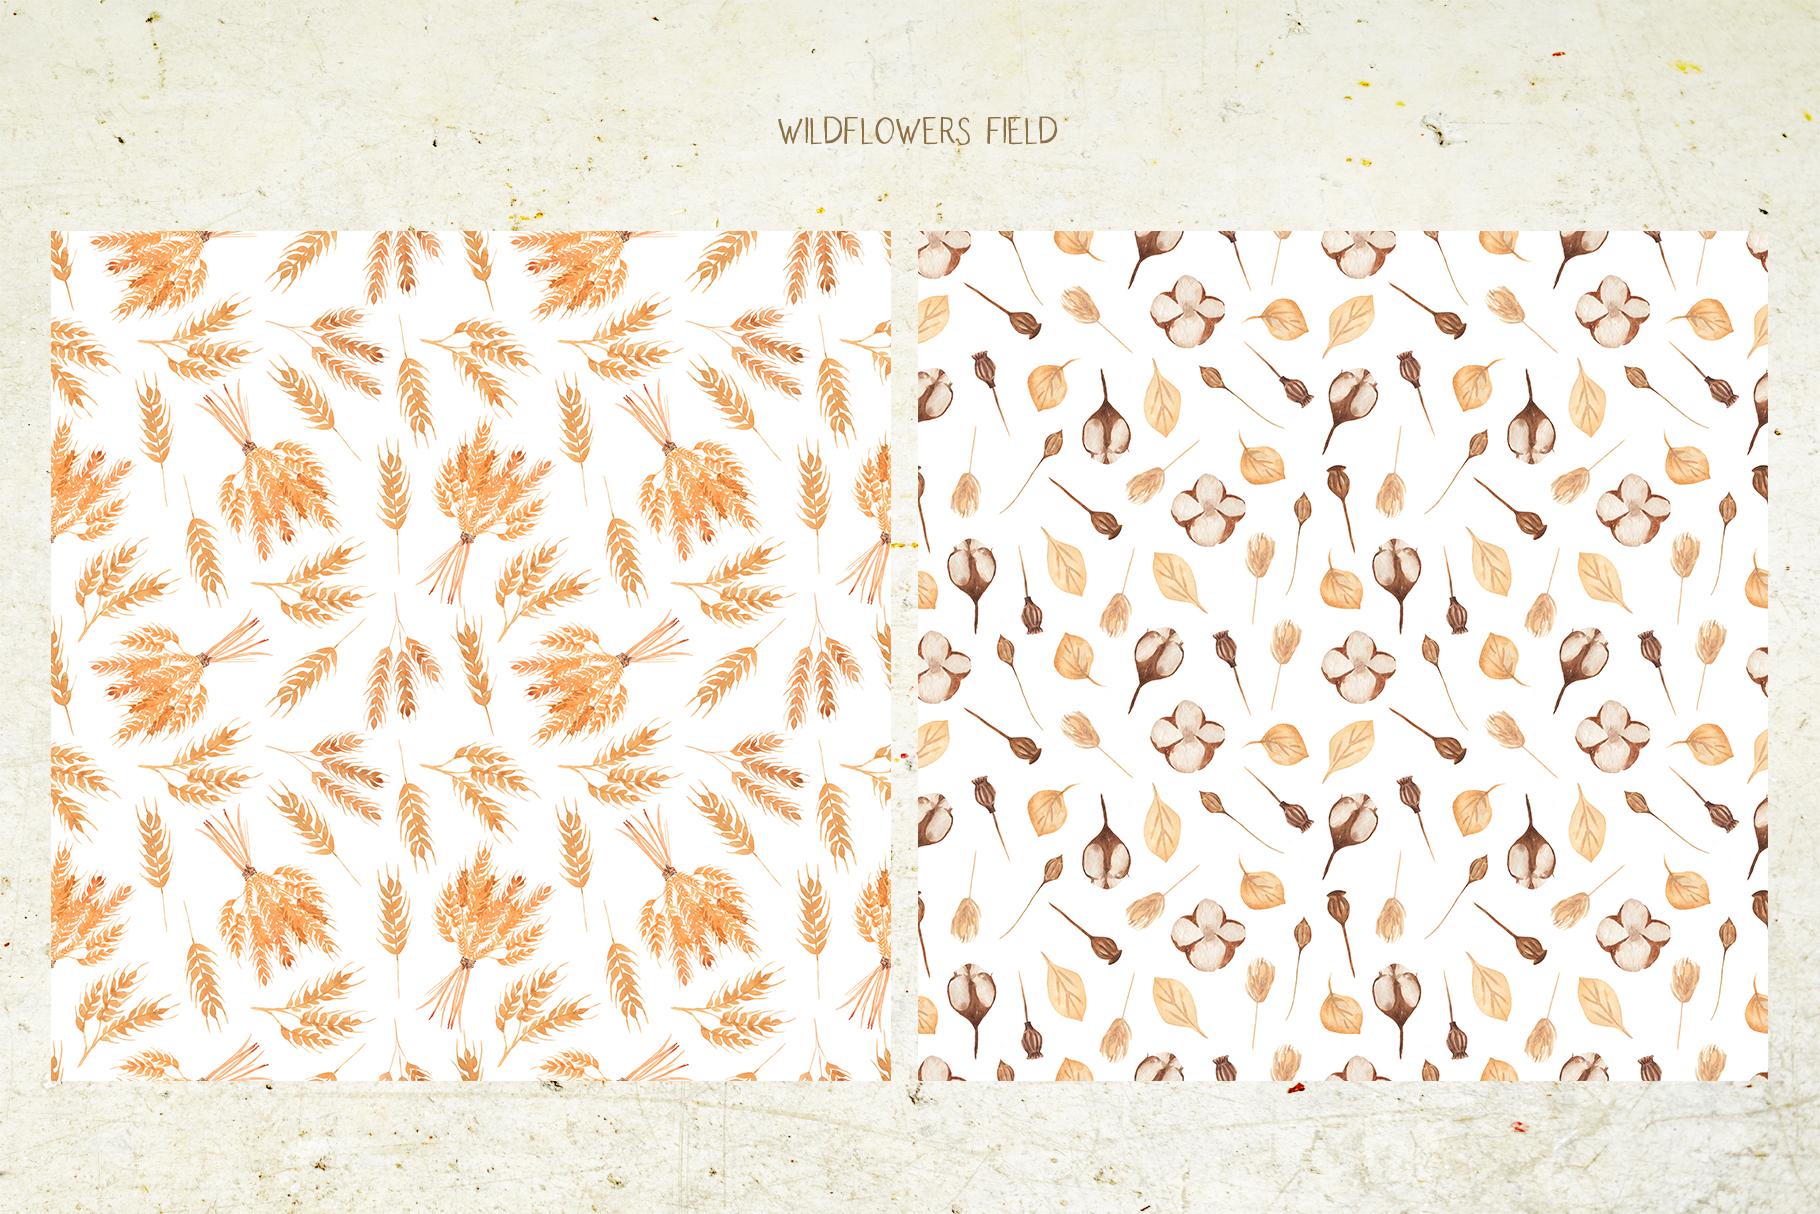 Wildflowers field example image 6